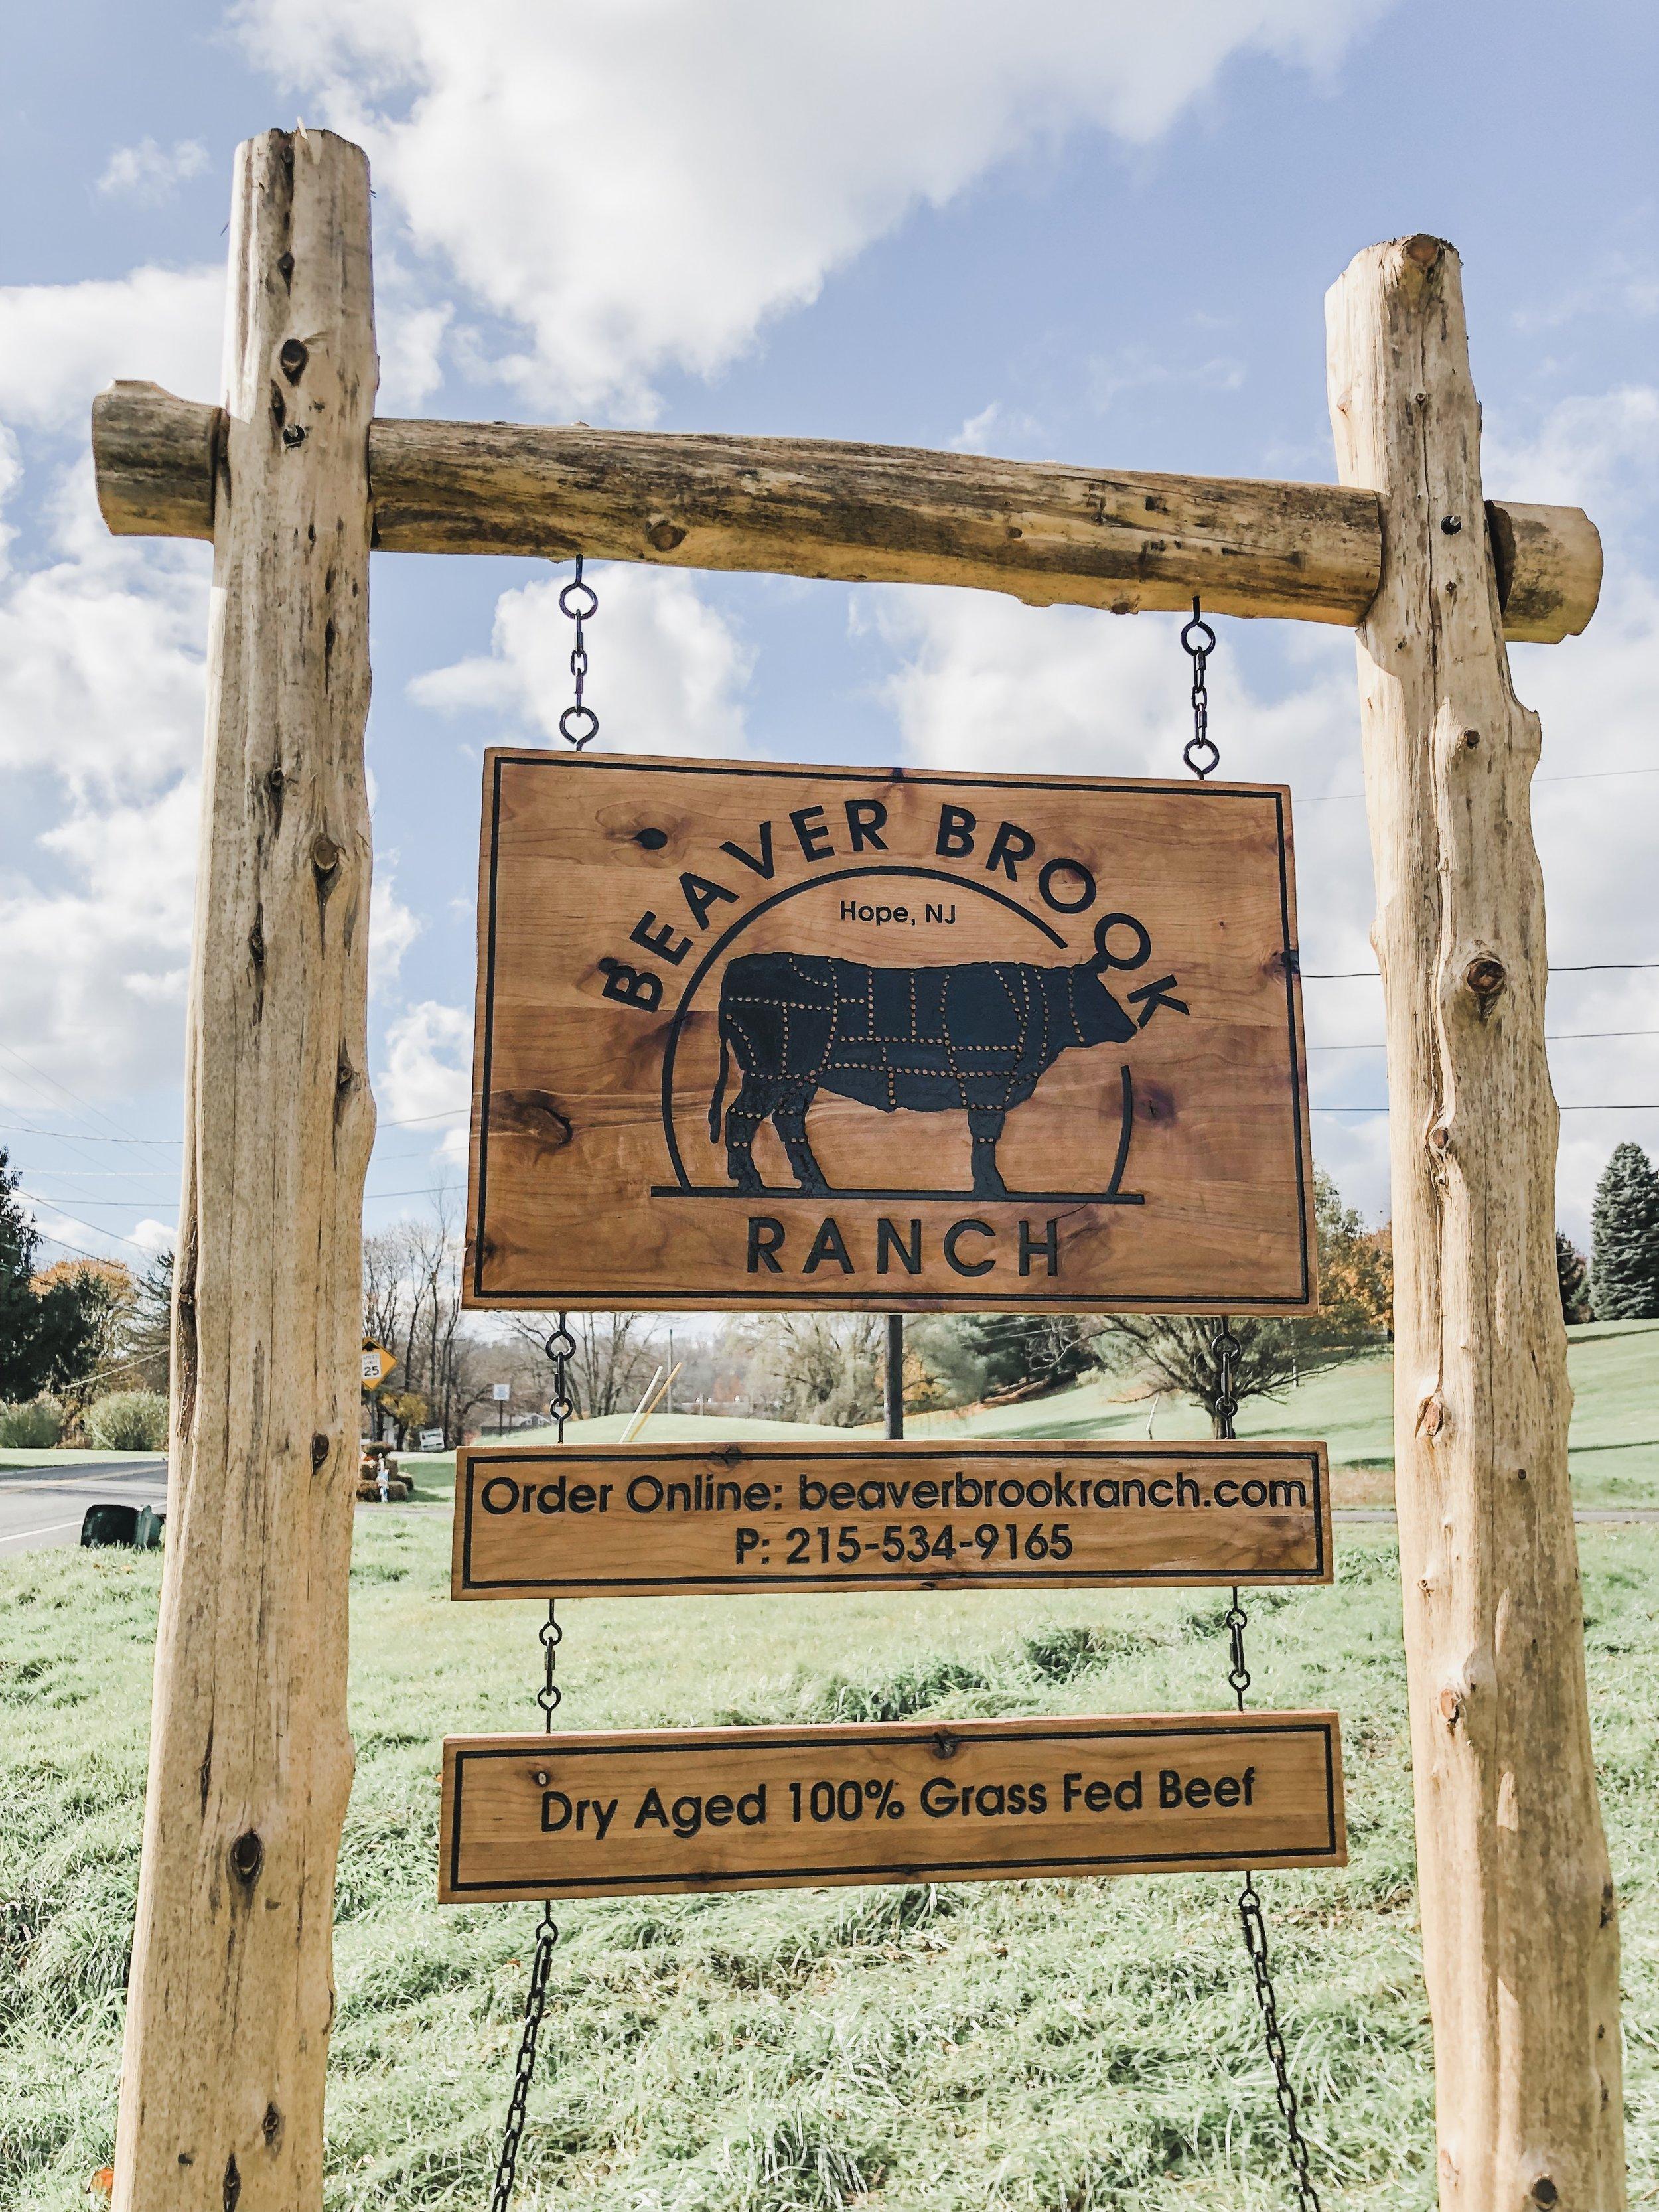 Beaver Brook Ranch